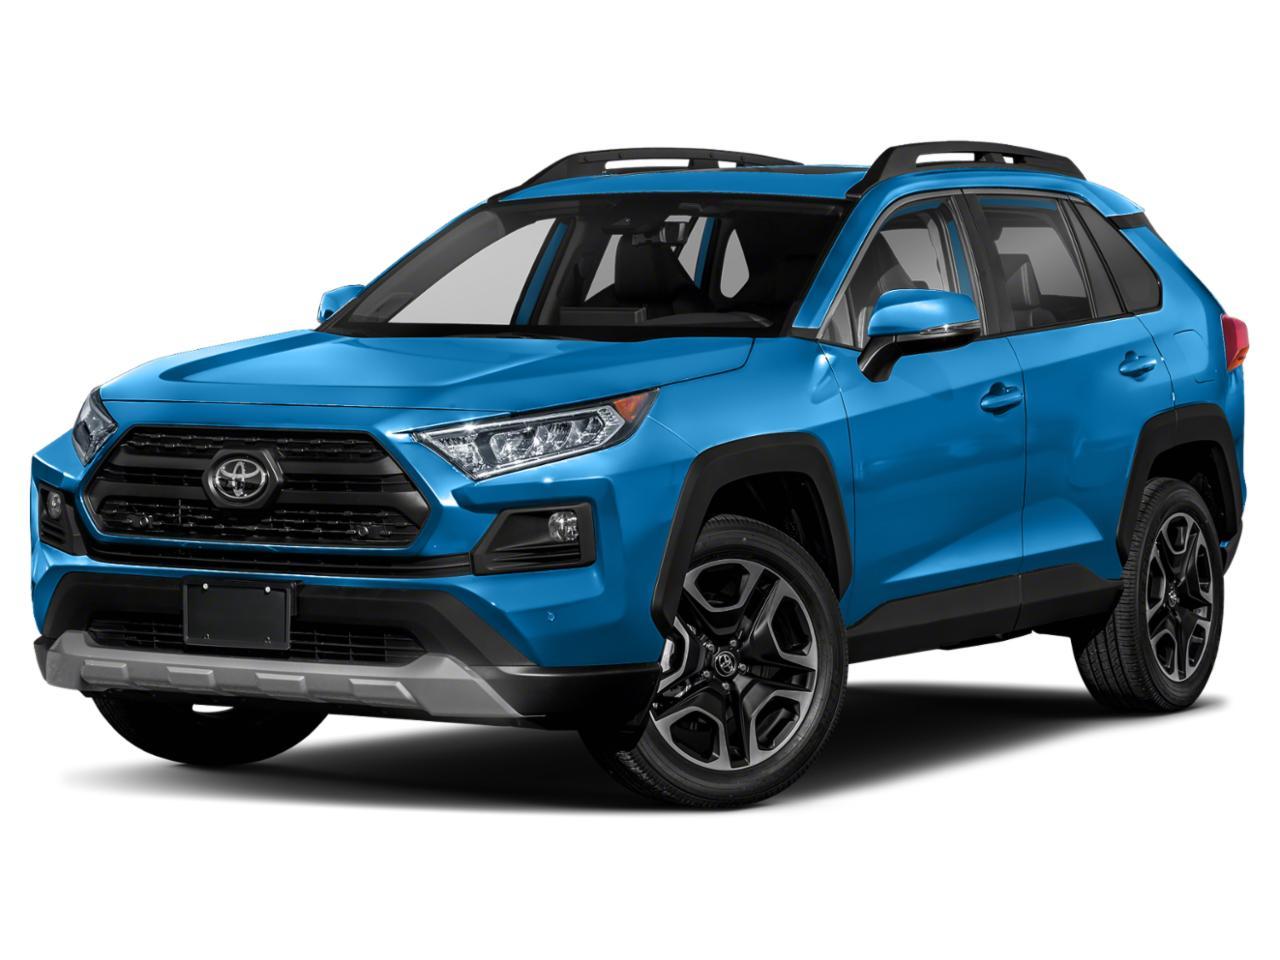 2019 Toyota RAV4 Vehicle Photo in Streetsboro, OH 44241